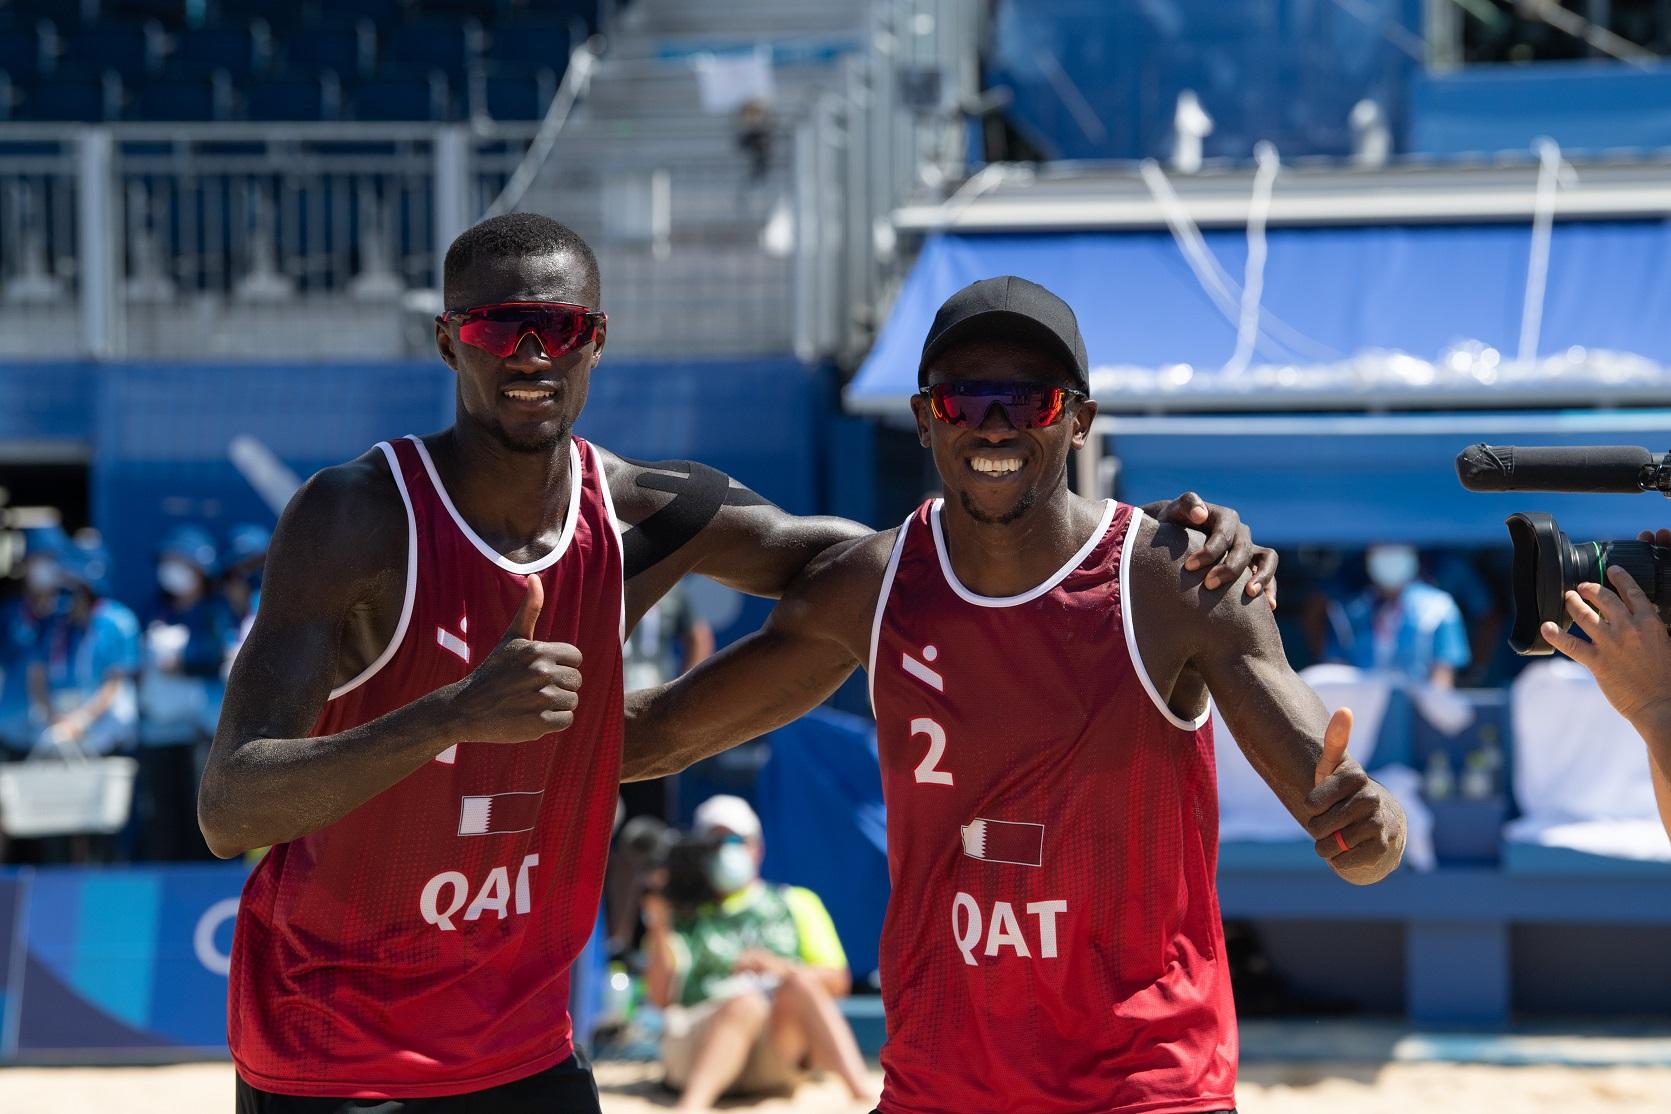 Tokyo 2020: Qatar's Beach Volleyball Team Aspire for Semi-Finals